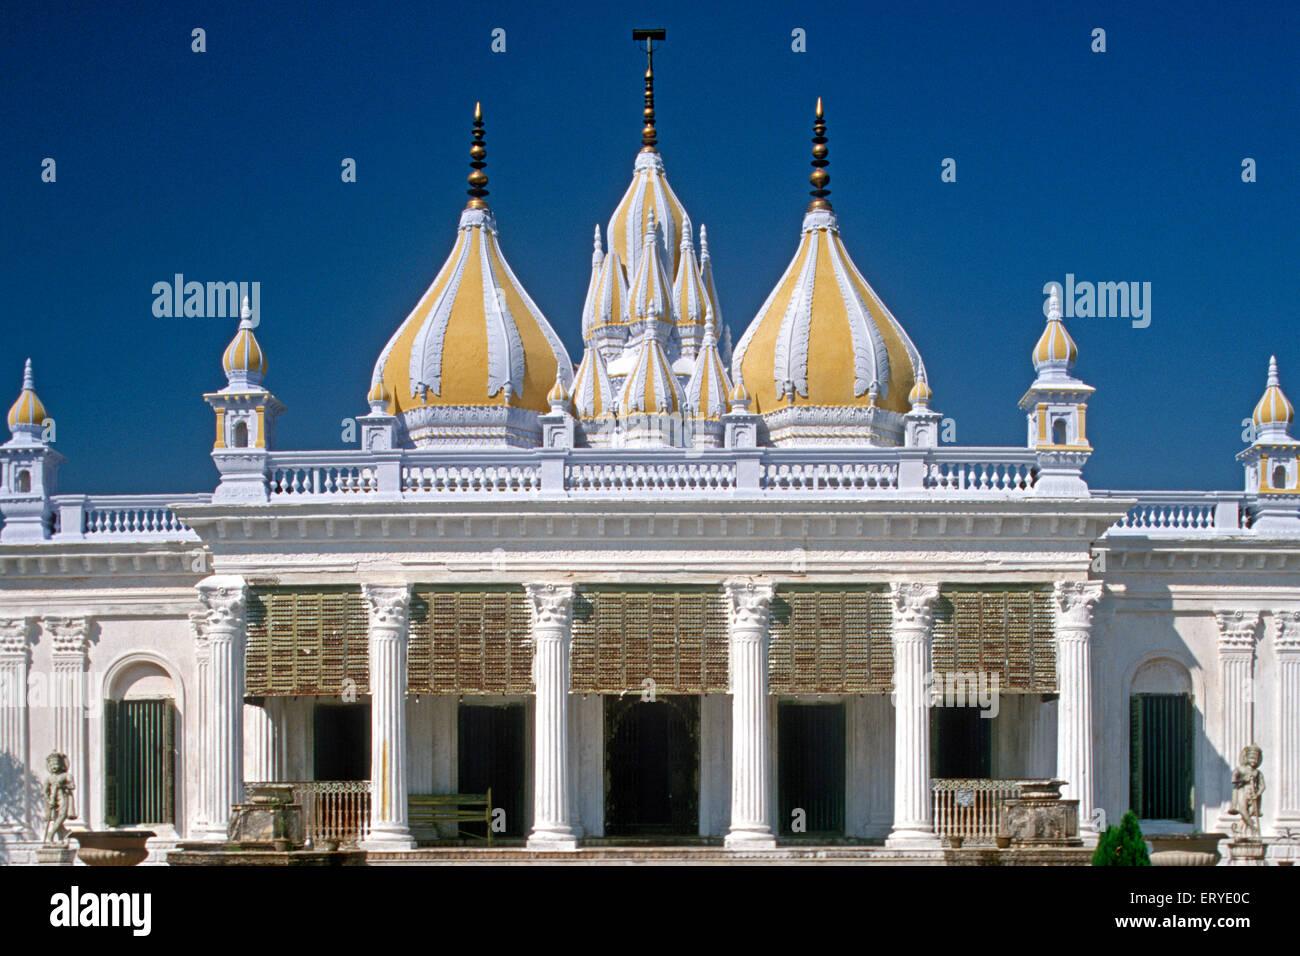 Over architectural heritage ; CPA Piramal gallery in Mumbai ; first Parasvnath Jain temple ; Murshidabad - Stock Image